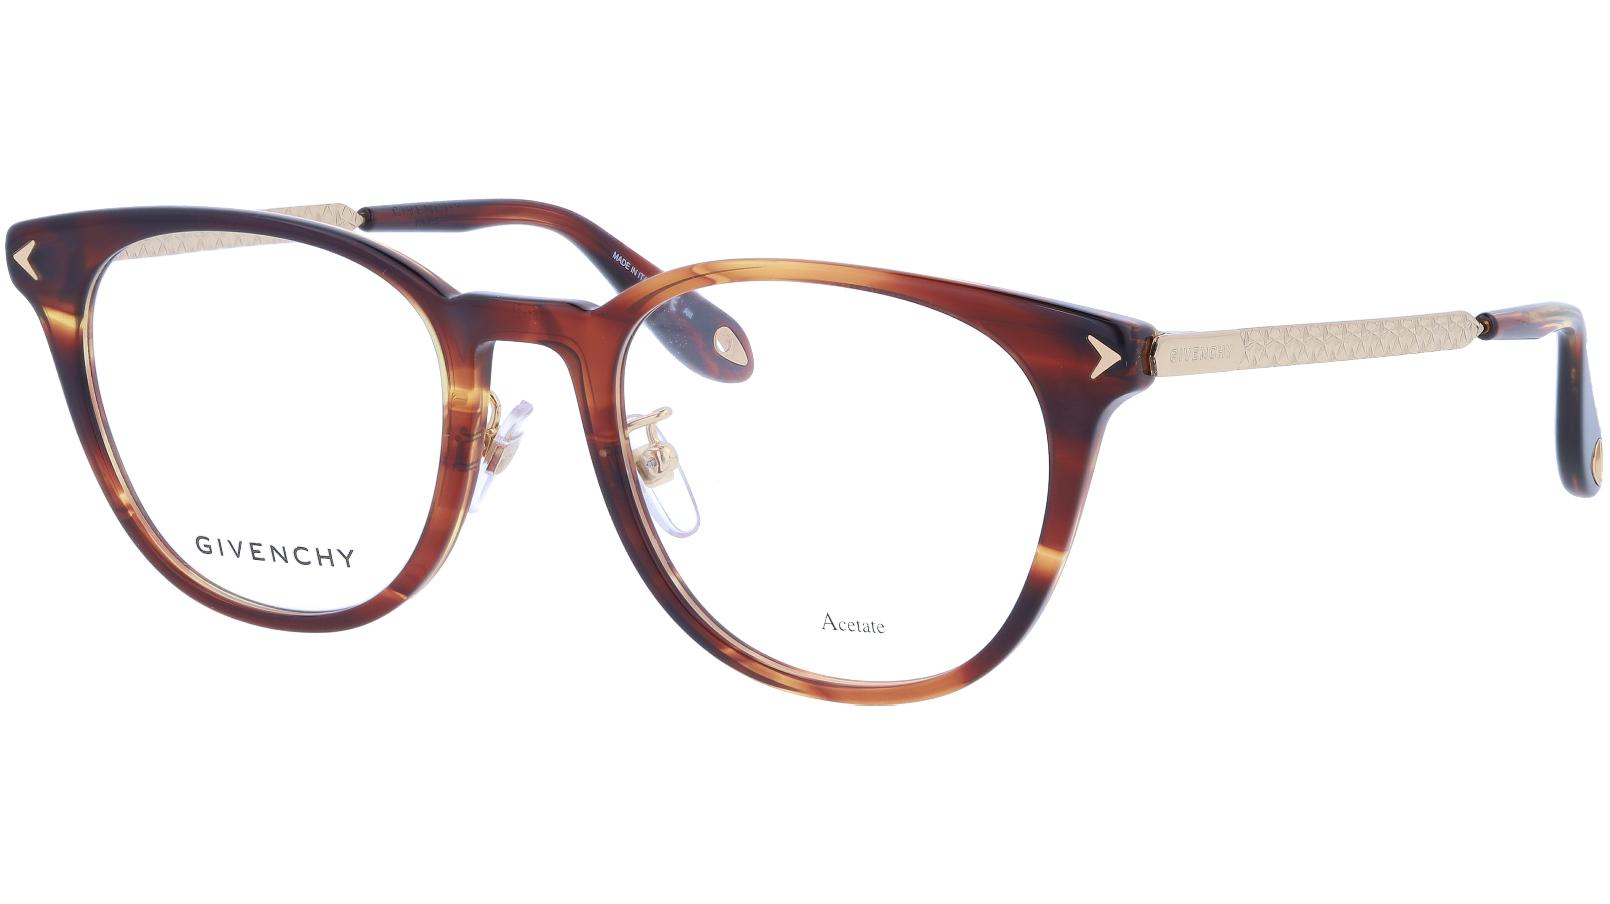 GIVENCHY GV0086F KVI 51 STRIPED Glasses